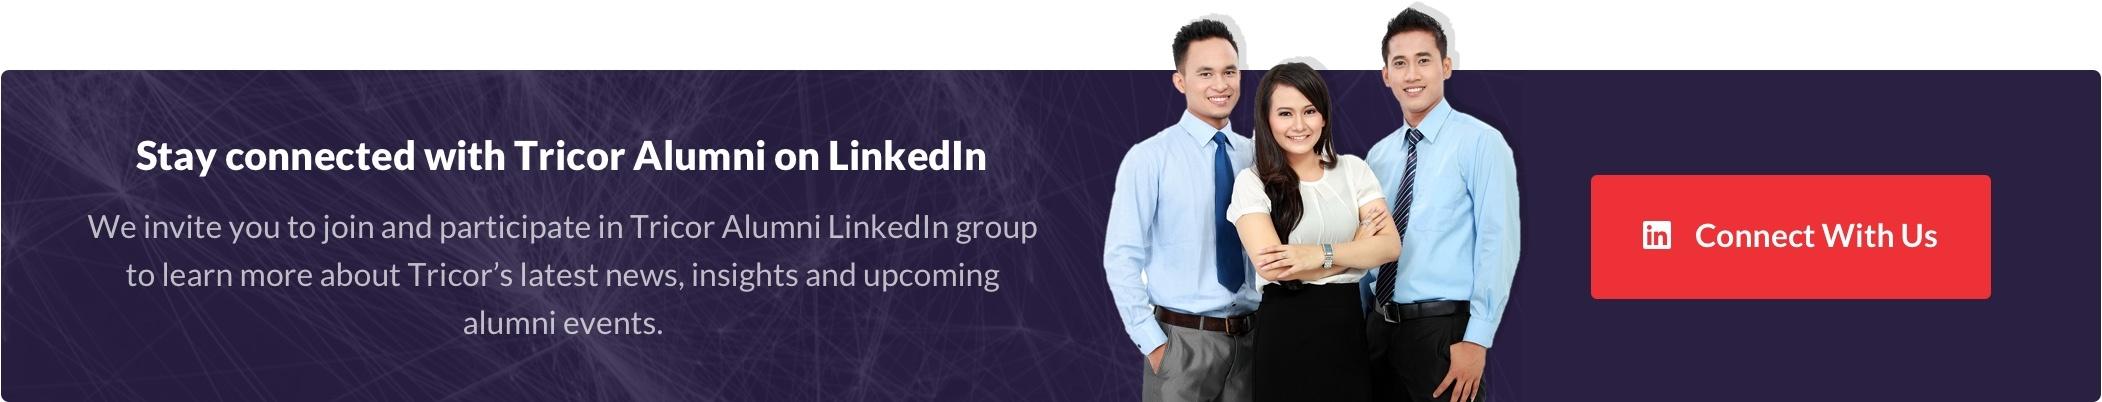 Tricor Alumni LinkedIn